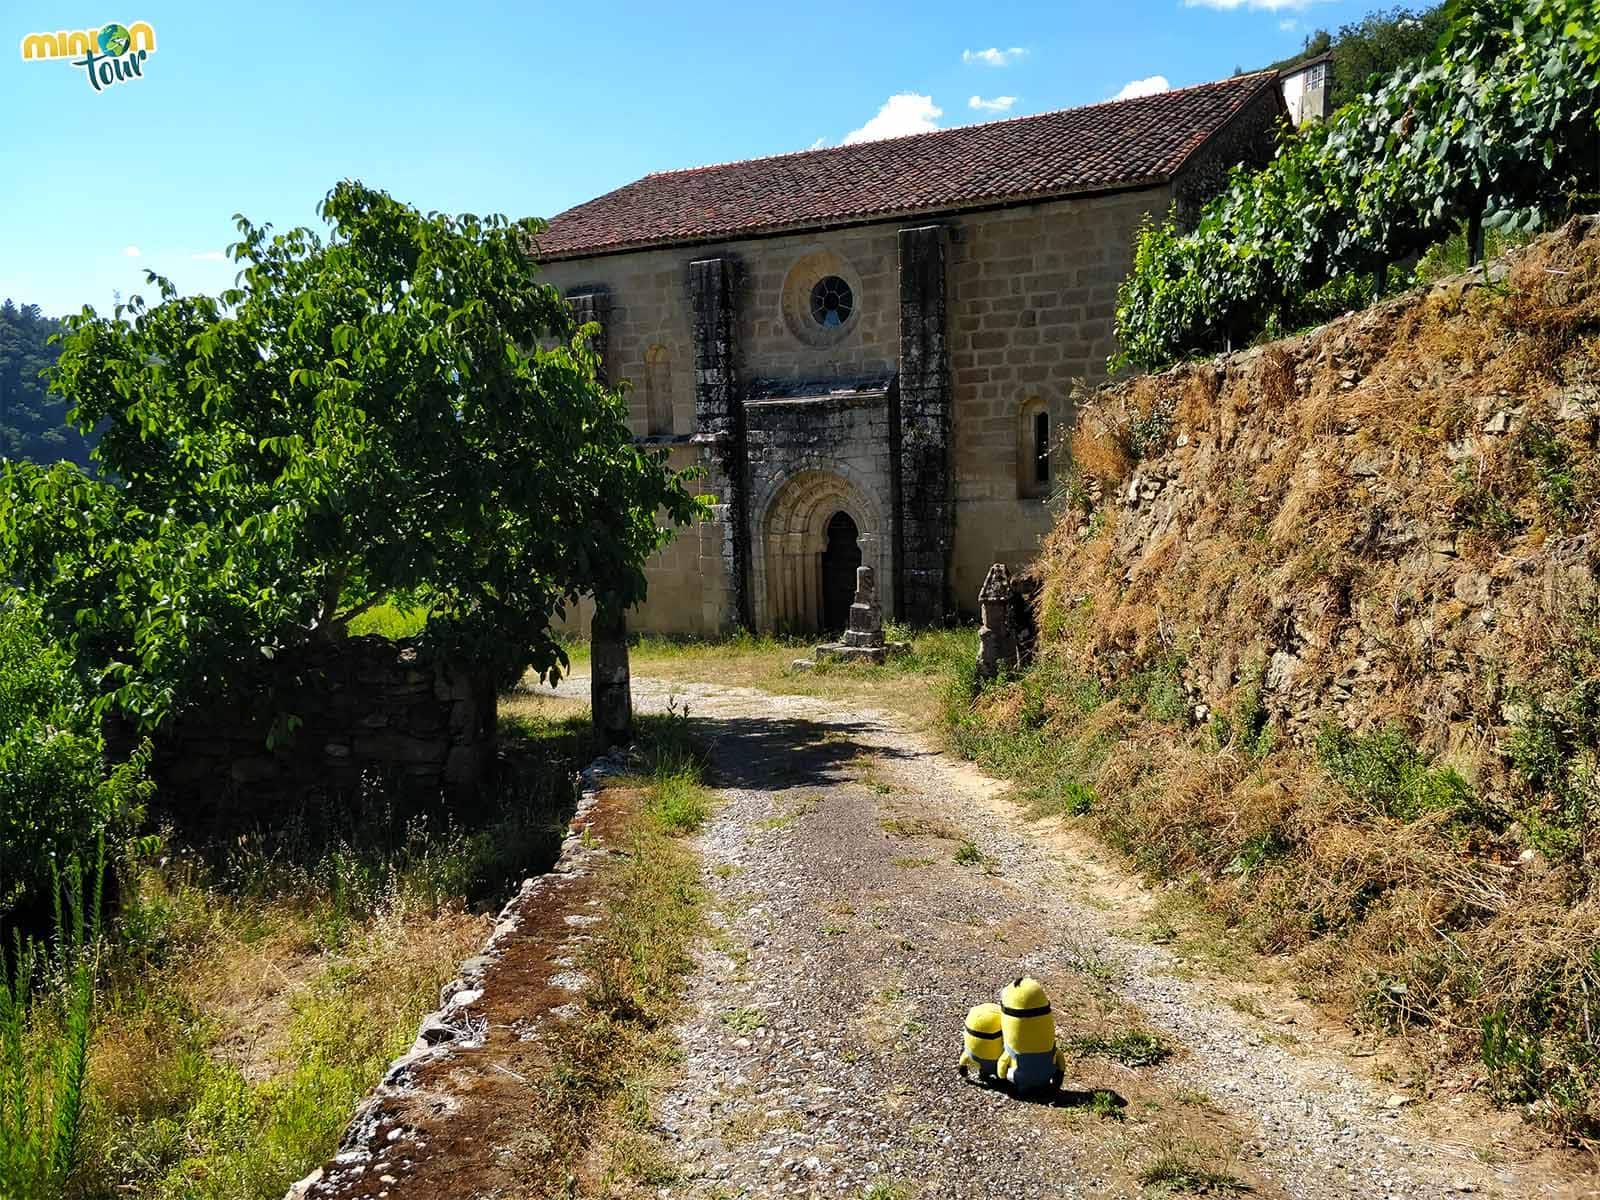 Ruta del Románico de la Ribeira Sacra.